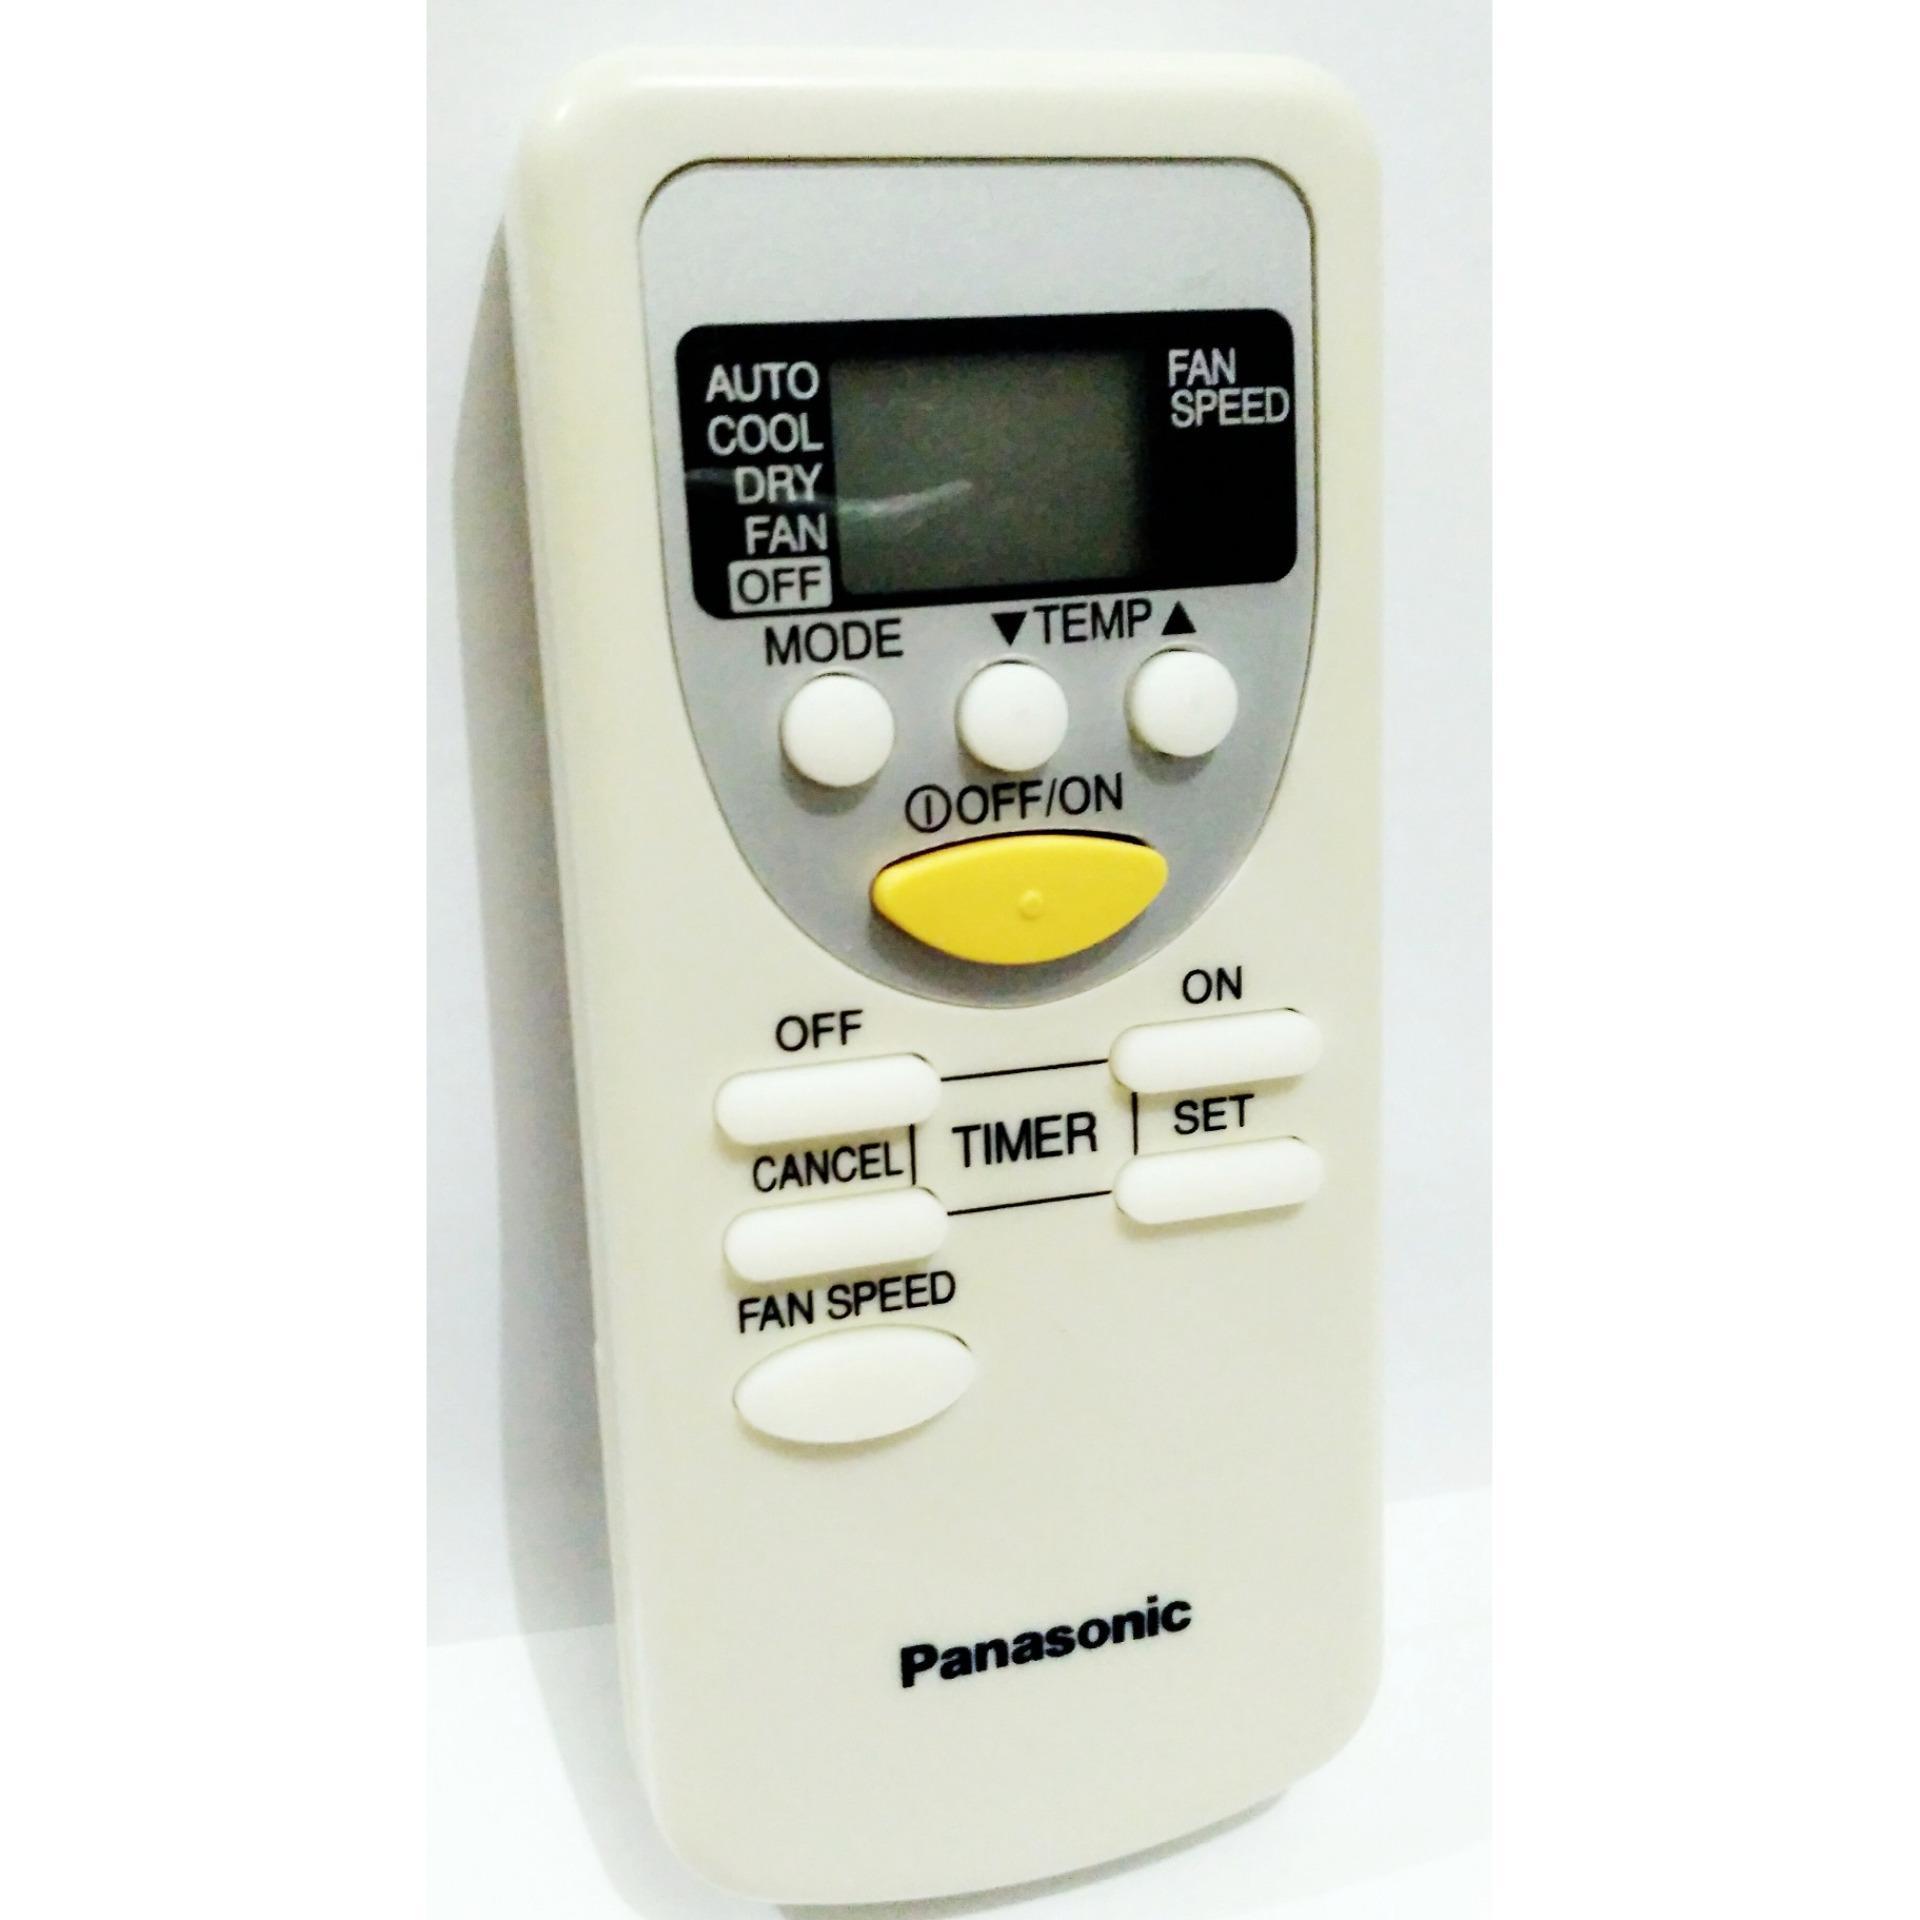 Remote AC Panasonic - Standing/ Remot Controller